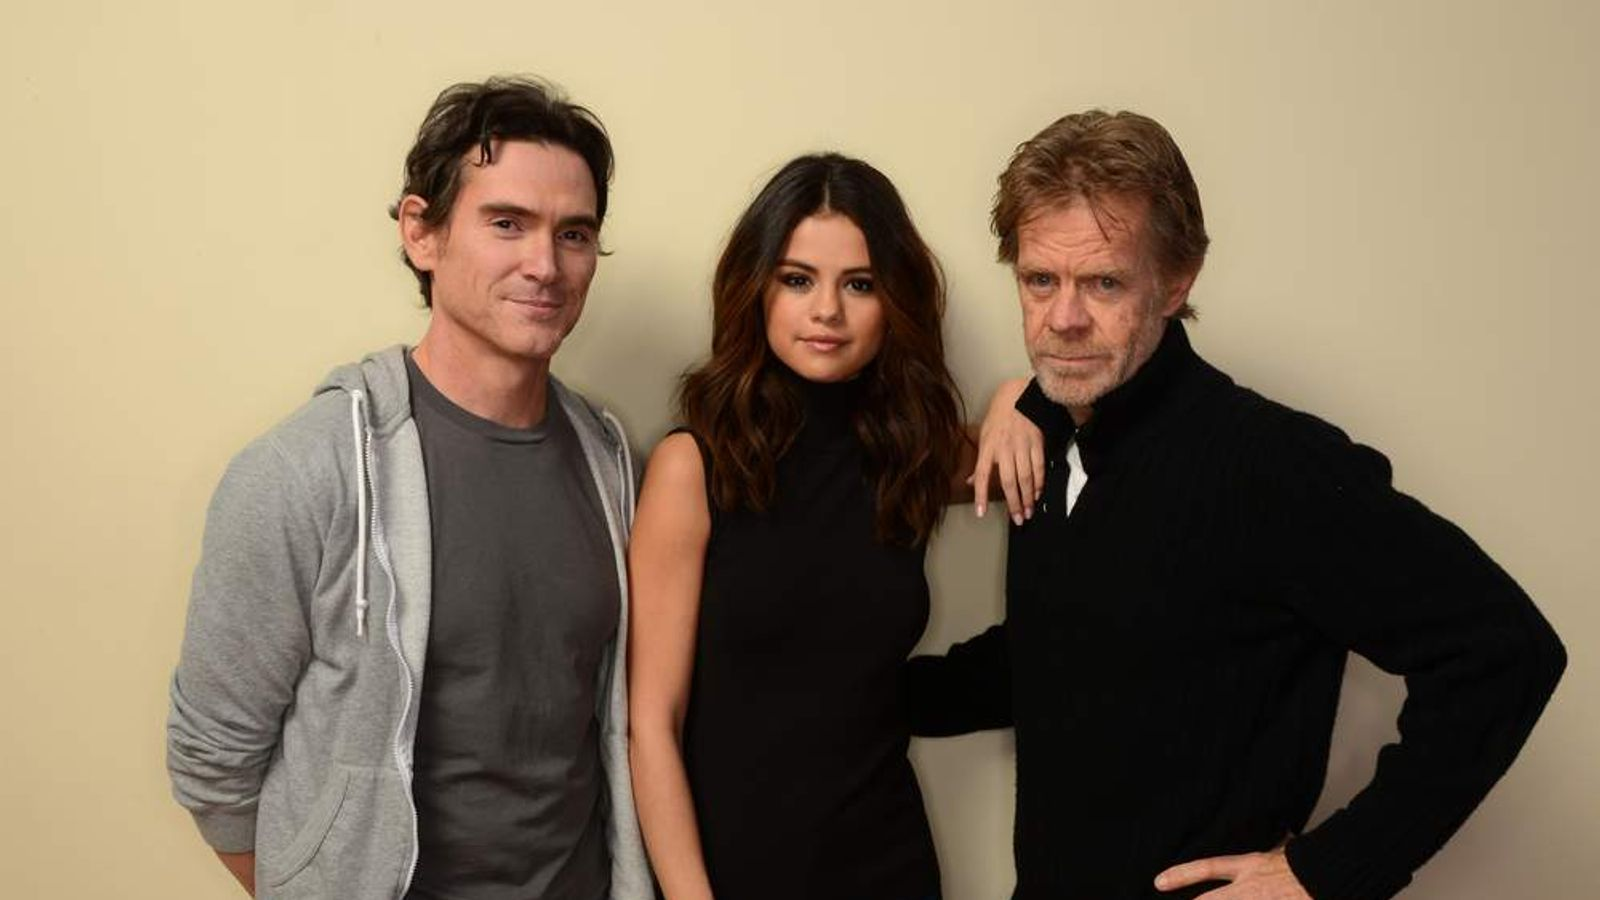 Billy Crudup, Selena Gomez, and William H. Macy